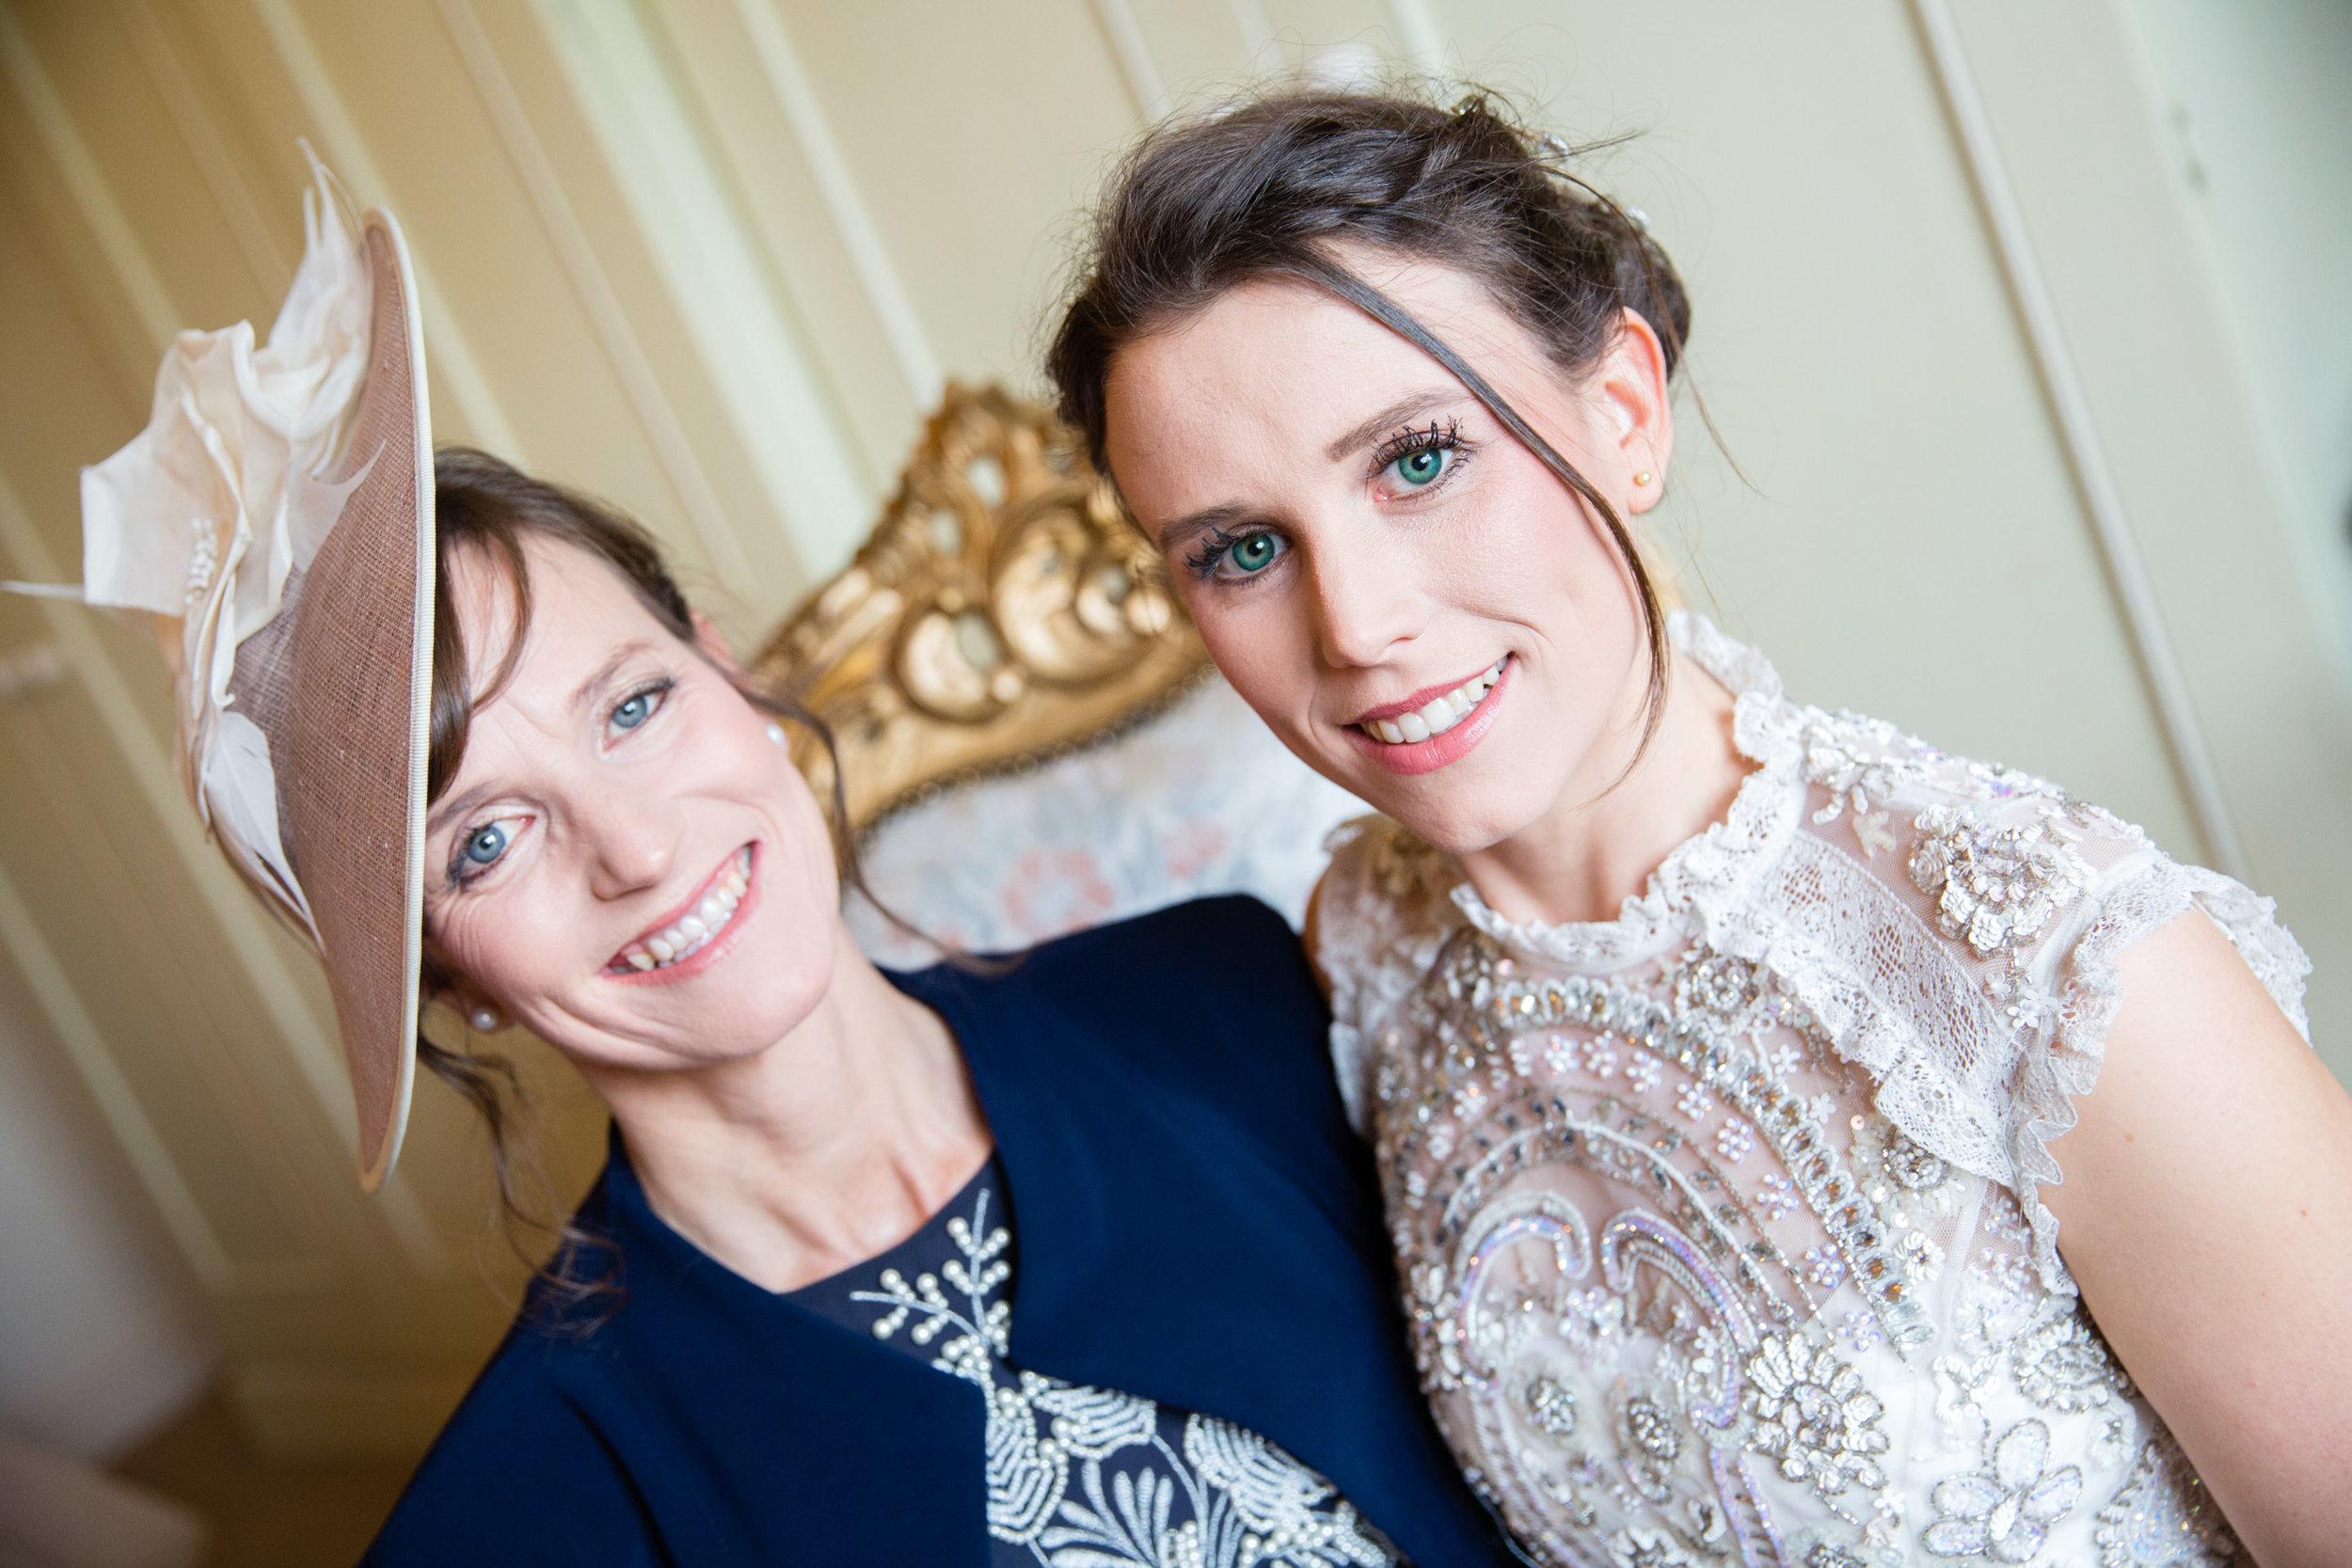 Jess & Ben - Bristol Wedding Photographer - Wright Wedding Photography - 57